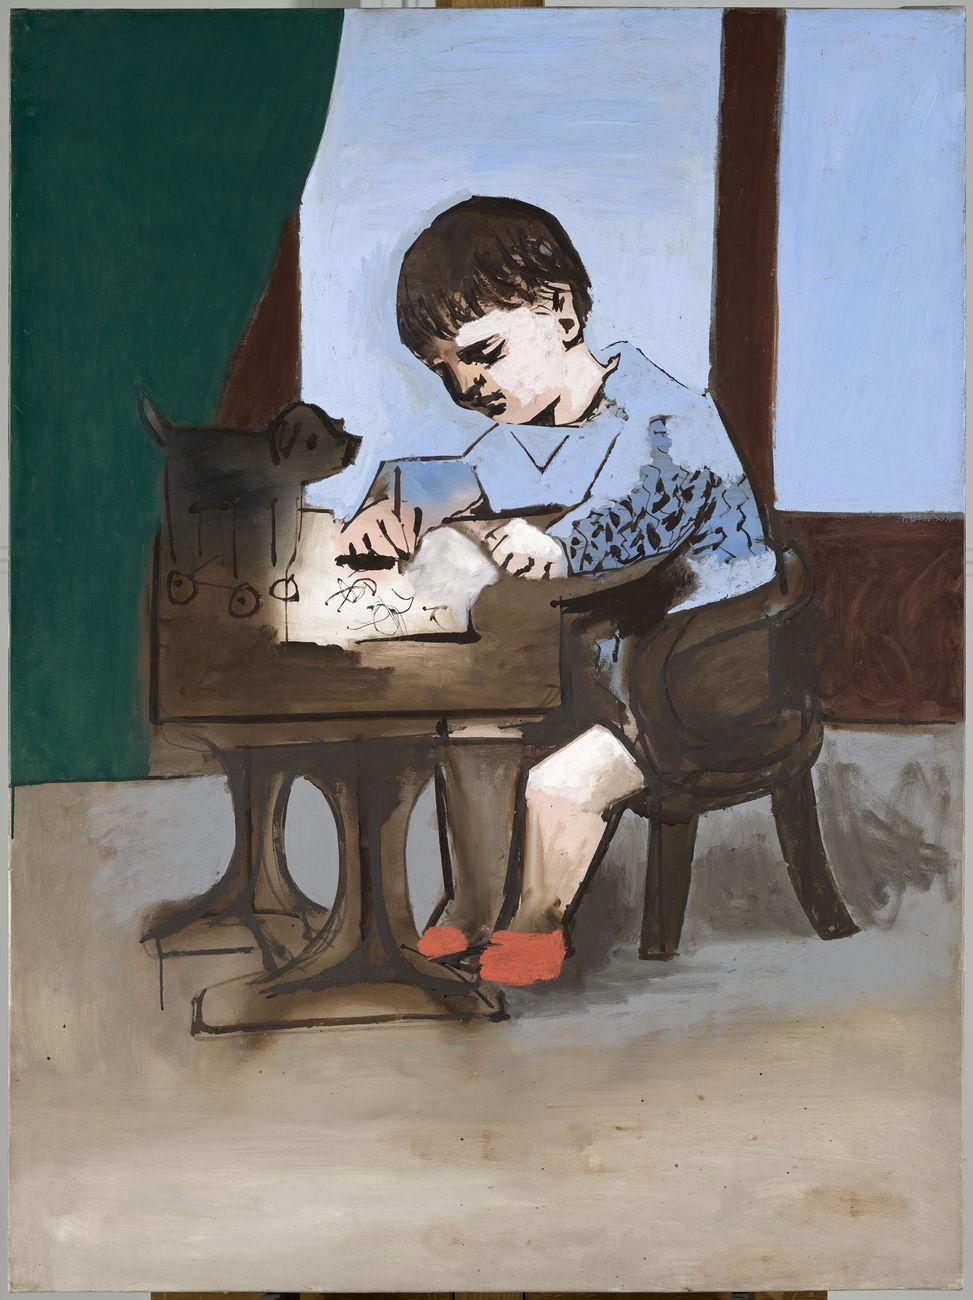 Pablo Picasso, Paul dessinant, 1923. Musée National Picasso Paris, Parigi © Succession Picasso, by SIAE 2017